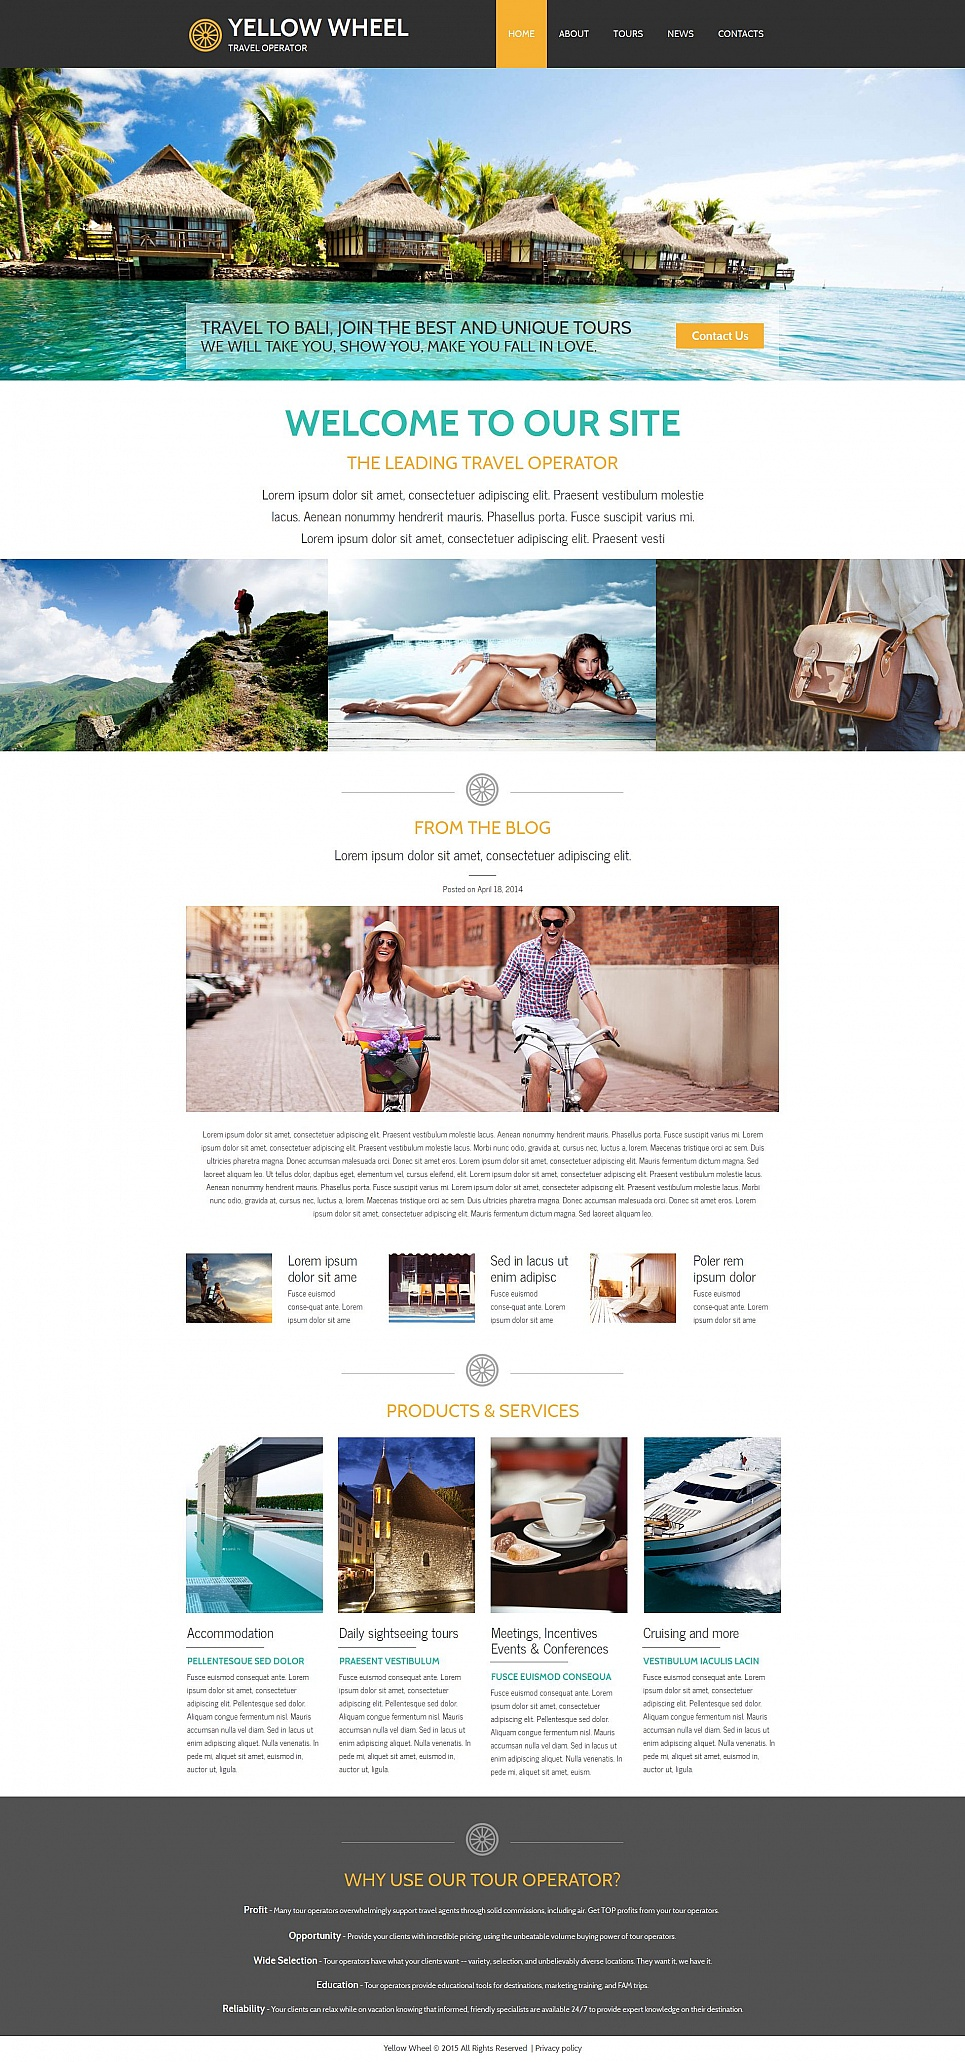 MotoCMS HTML Шаблон #55312 из категории Путешествия - image